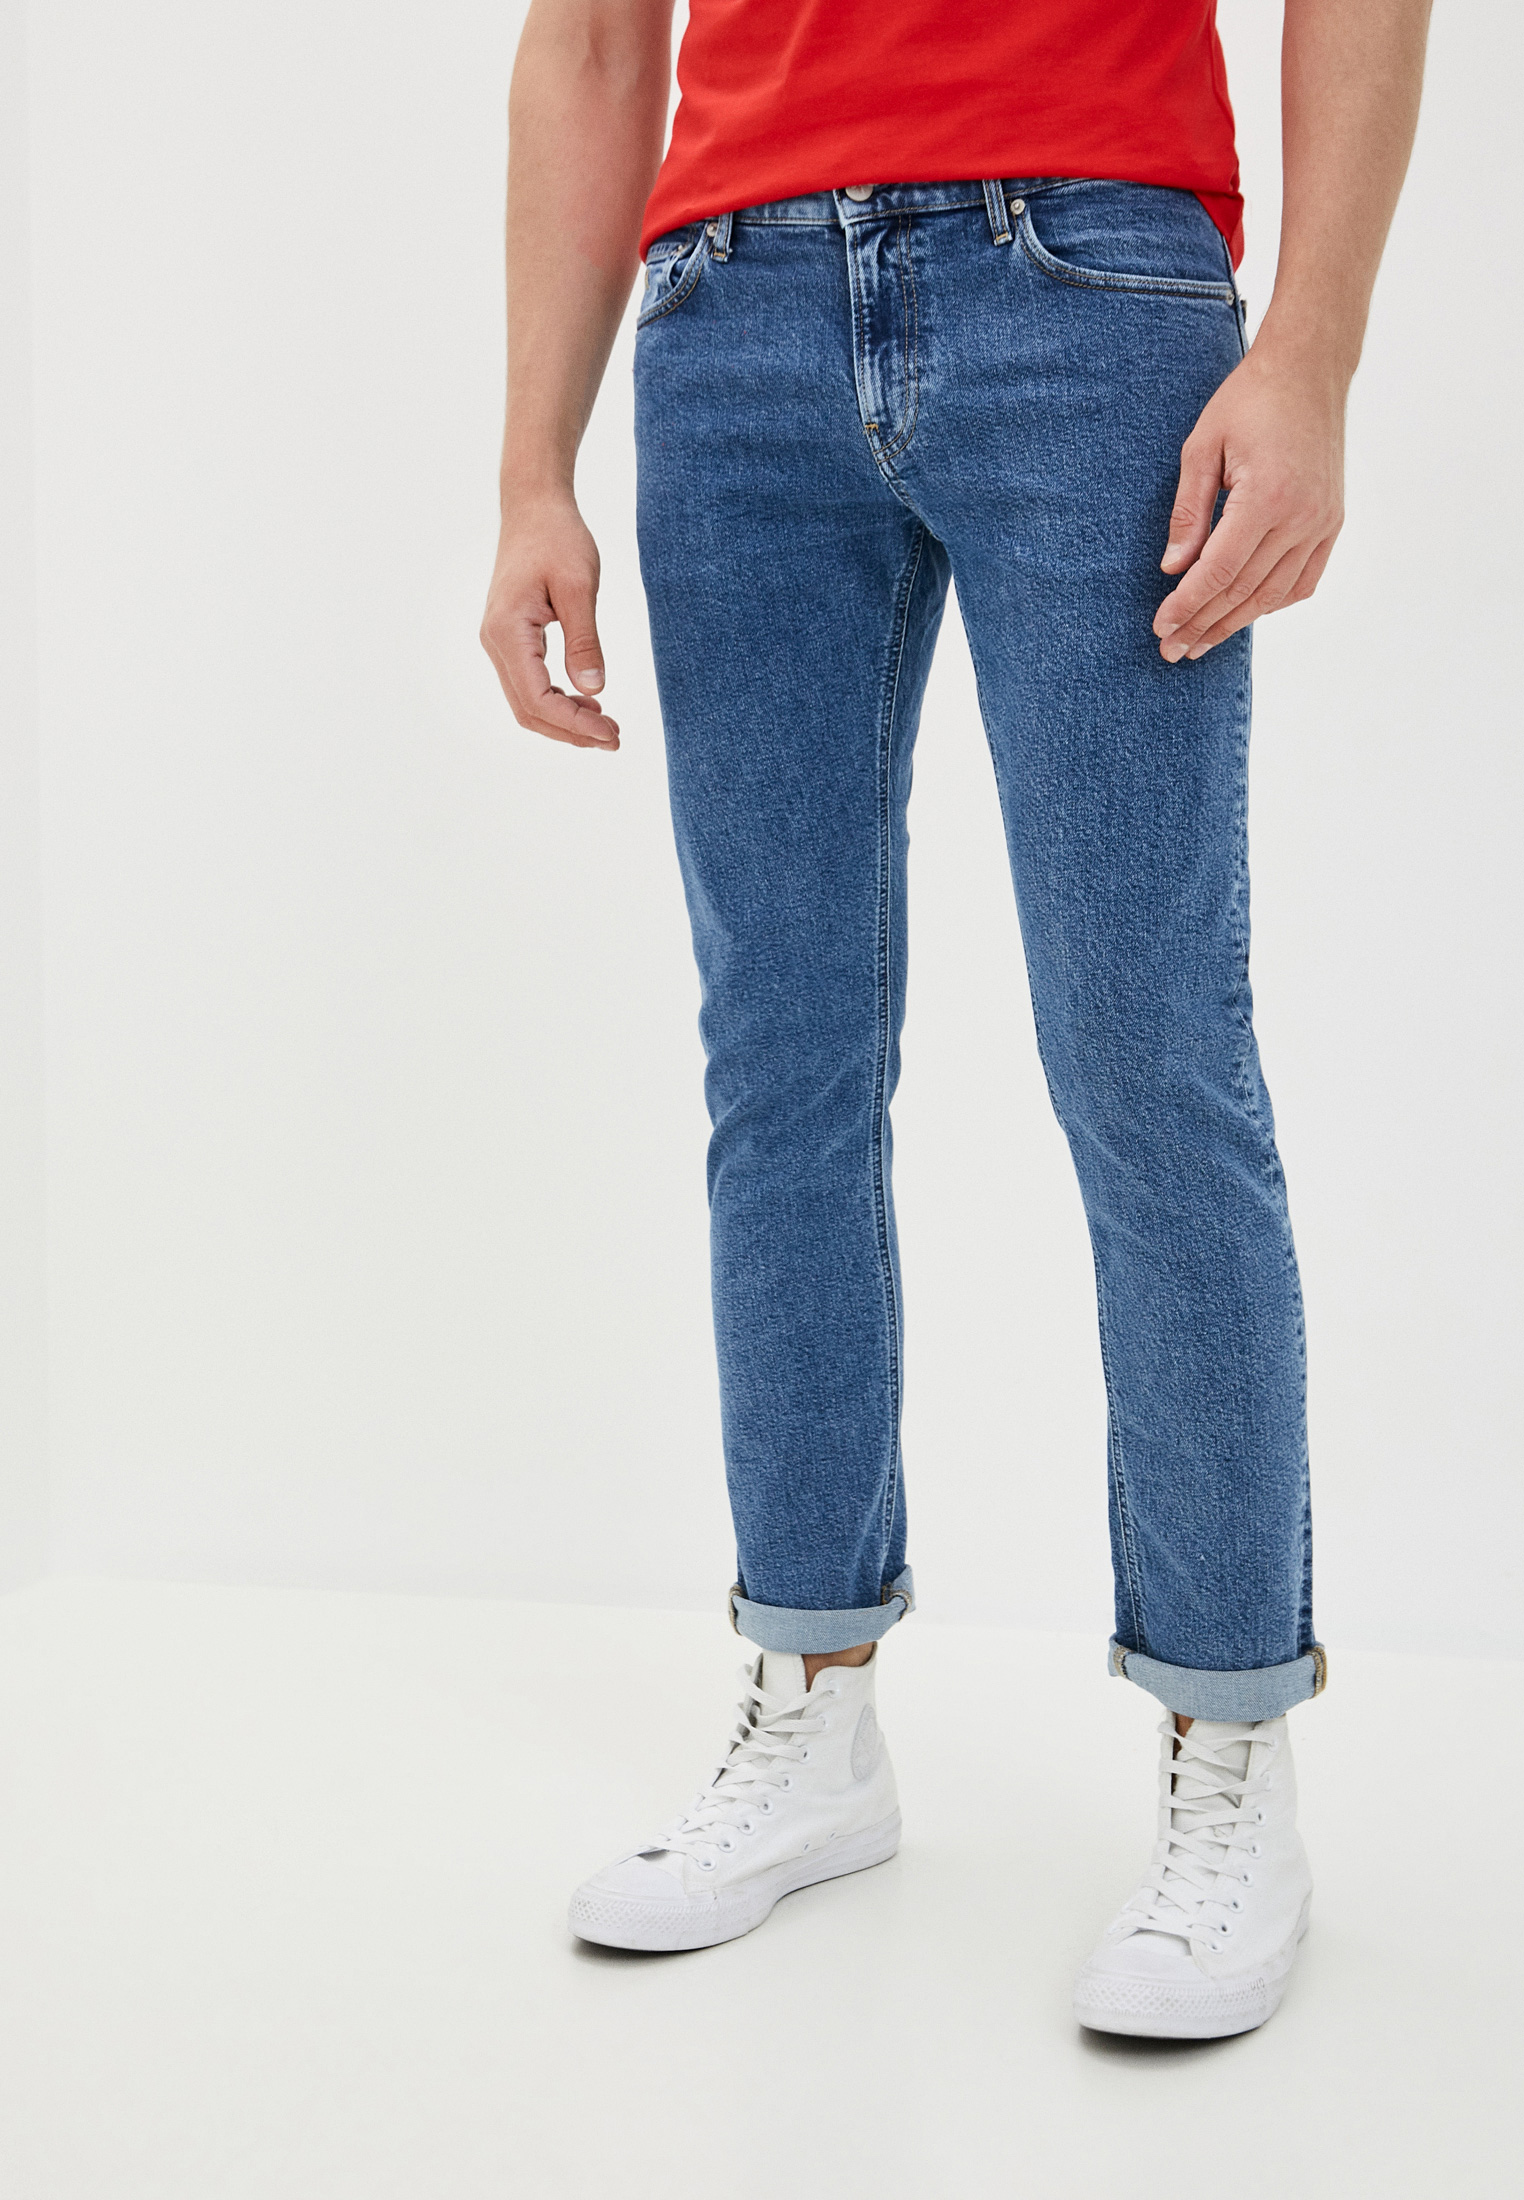 Джинсы Calvin Klein Jeans Slim за 10 300 ₽. в интернет-магазине Lamoda.ru